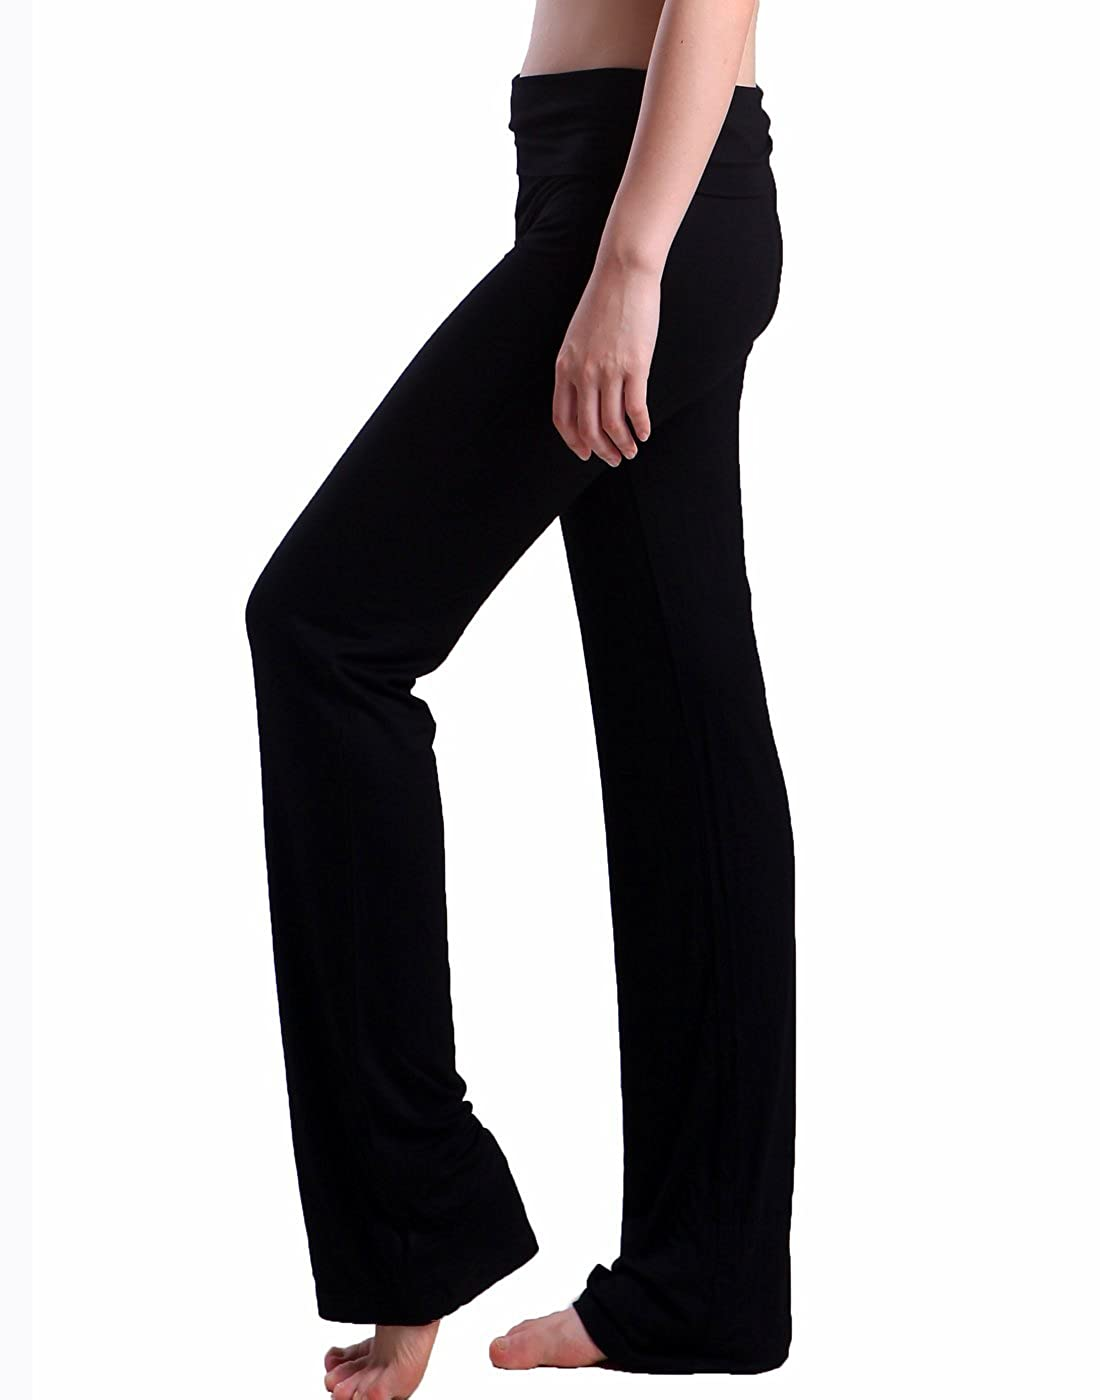 17697587bb HDE Women's Color Block Fold Over Waist Yoga Pants Flare Leg Workout  Leggings at Amazon Women's Clothing store: